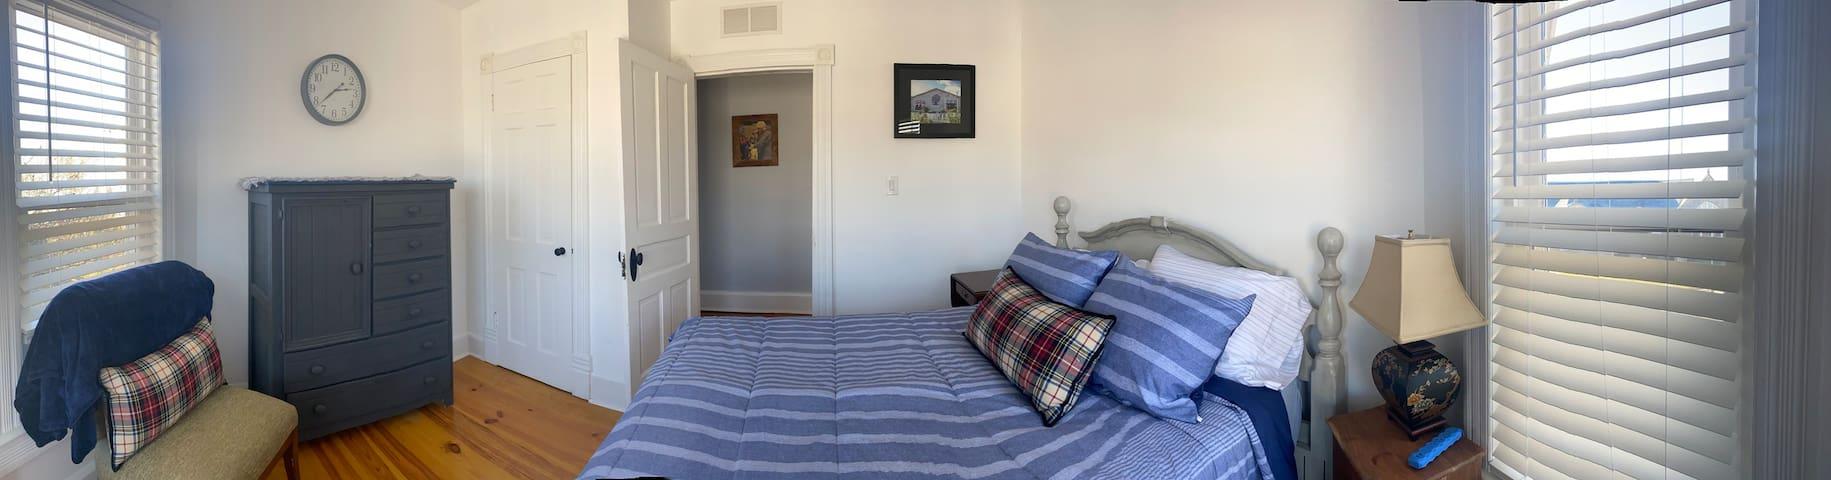 3 rd Bedroom-Full Size Bed- 2nd Floor